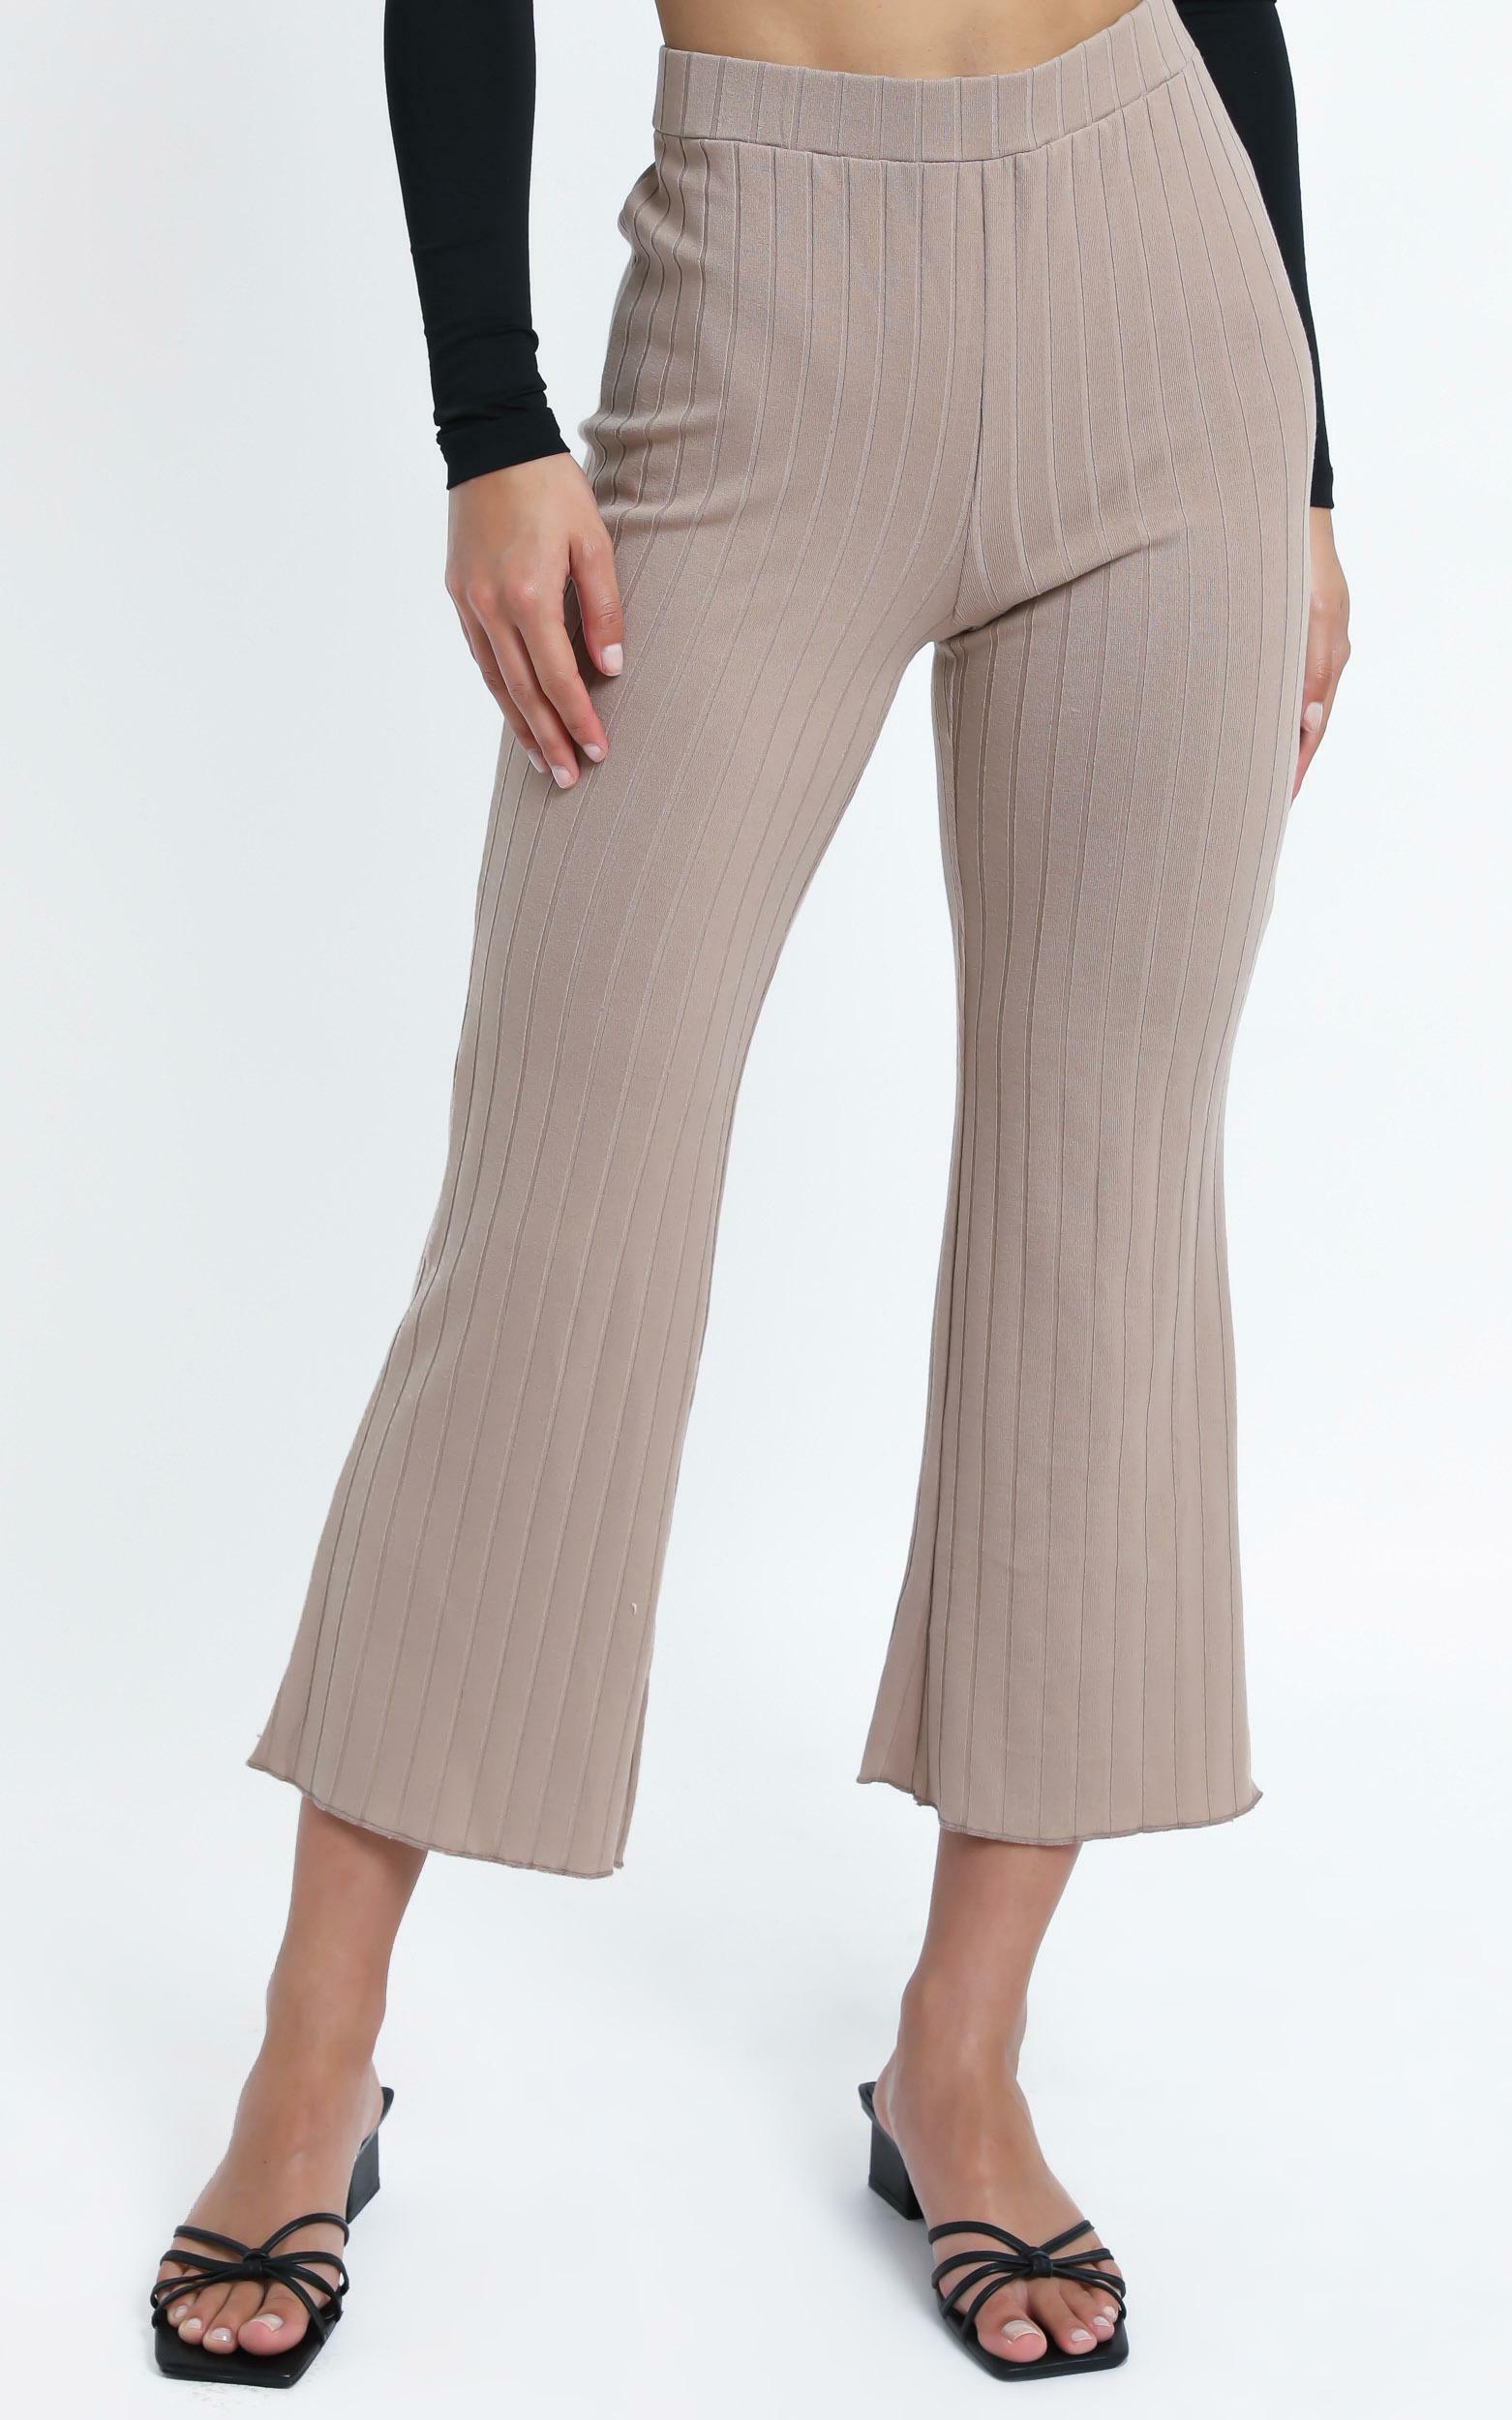 Alondra Pants in Beige - 14 (XL), Beige, hi-res image number null